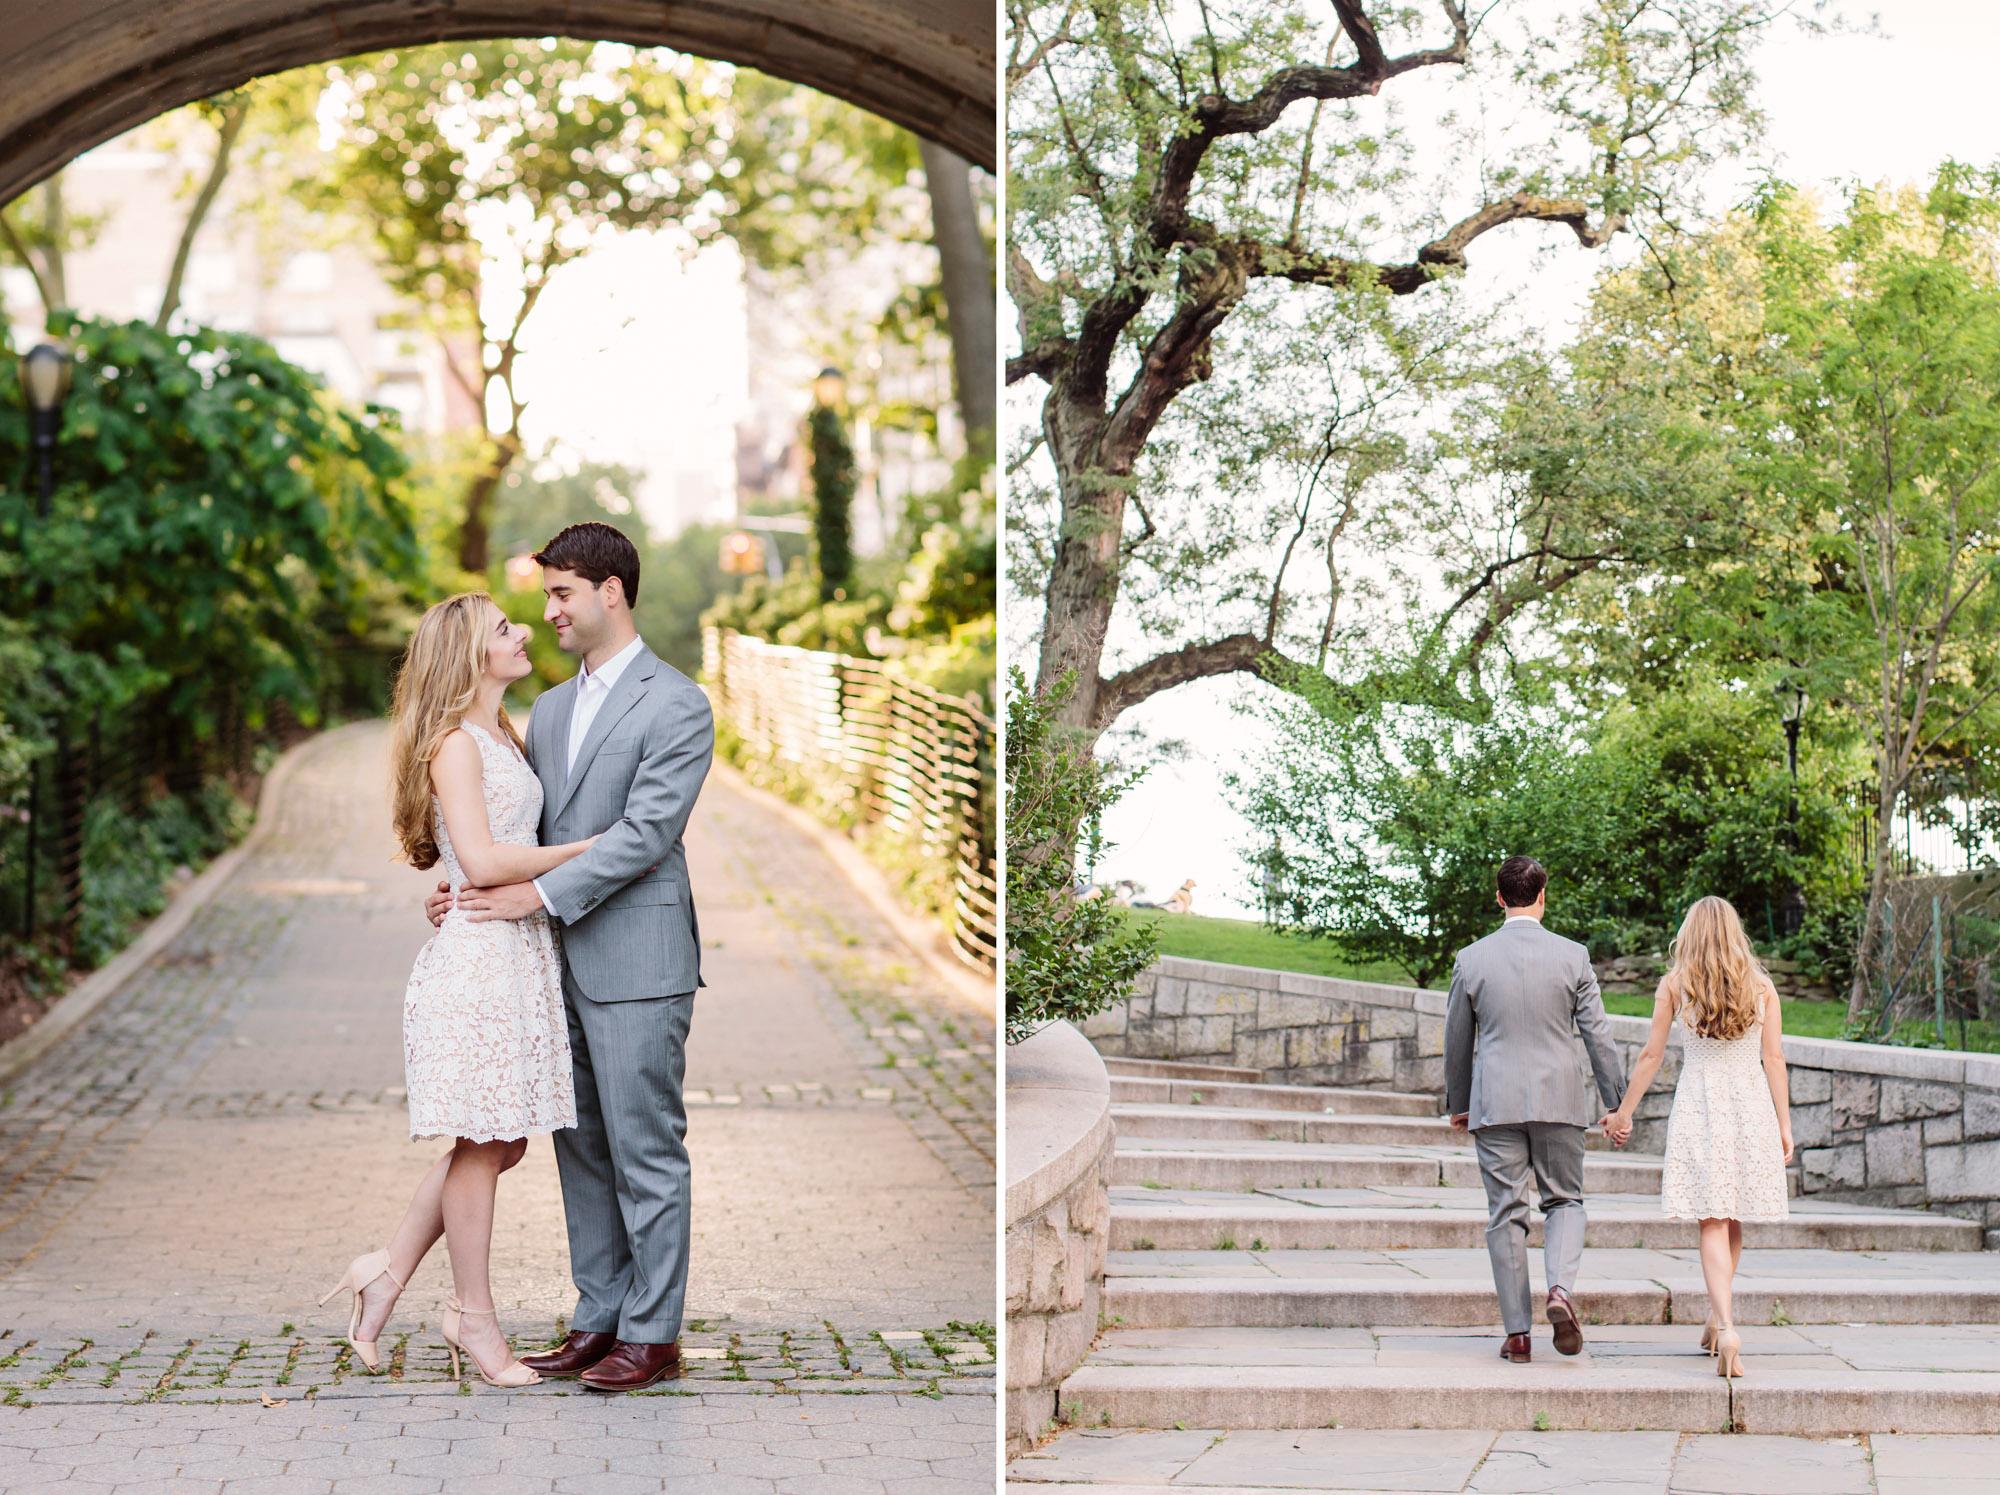 03_Christina_Daniel_Carl_Schurz_Park_Engagement_NYC_Tanya_Salazar_Phototgraphy.jpg